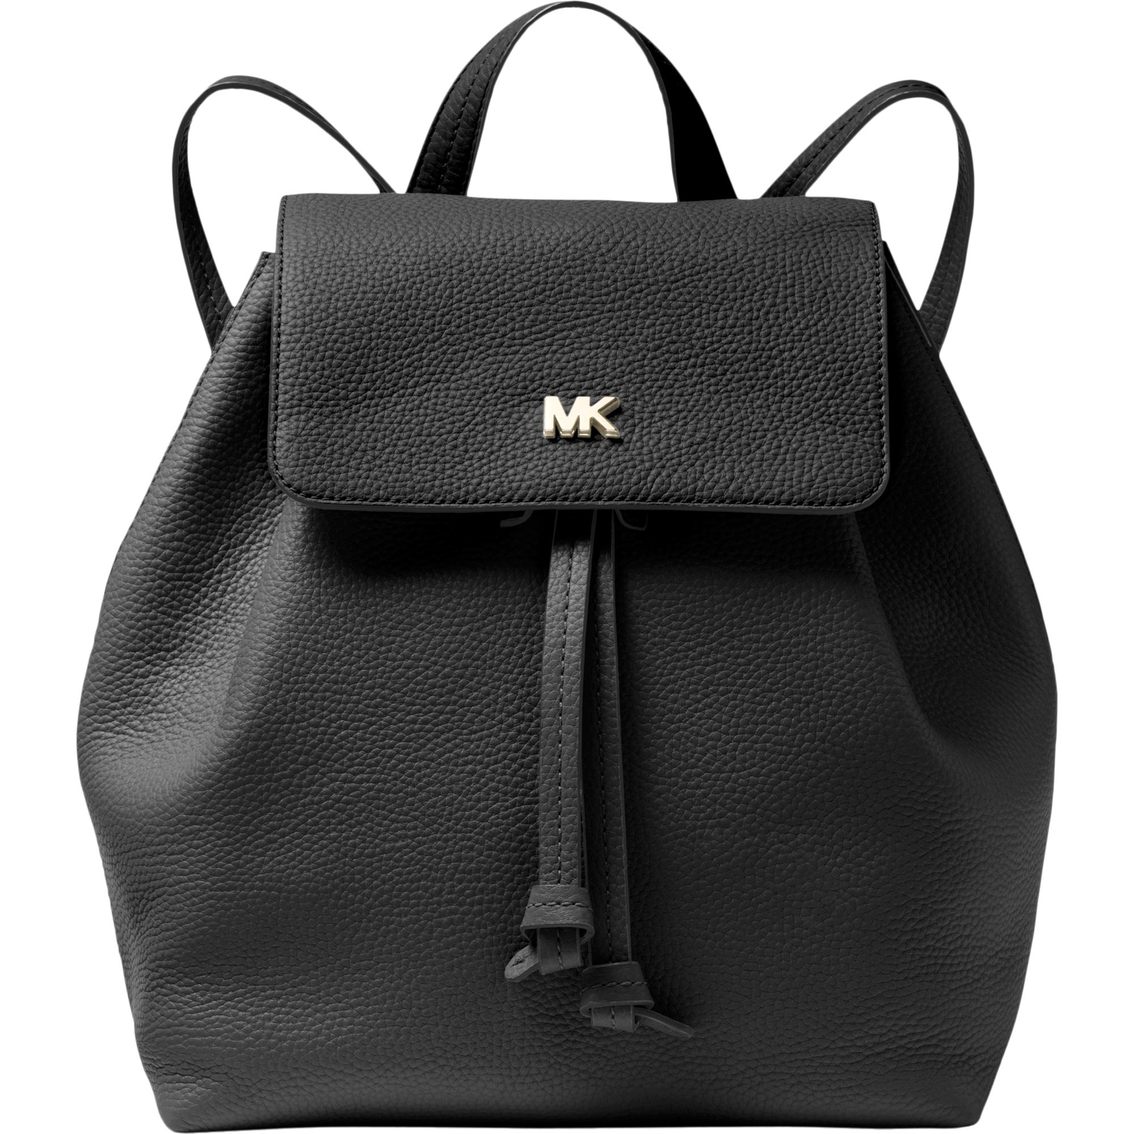 14a7d730024d Michael Kors Junie Leather Medium Flap Backpack | Backpacks | More ...